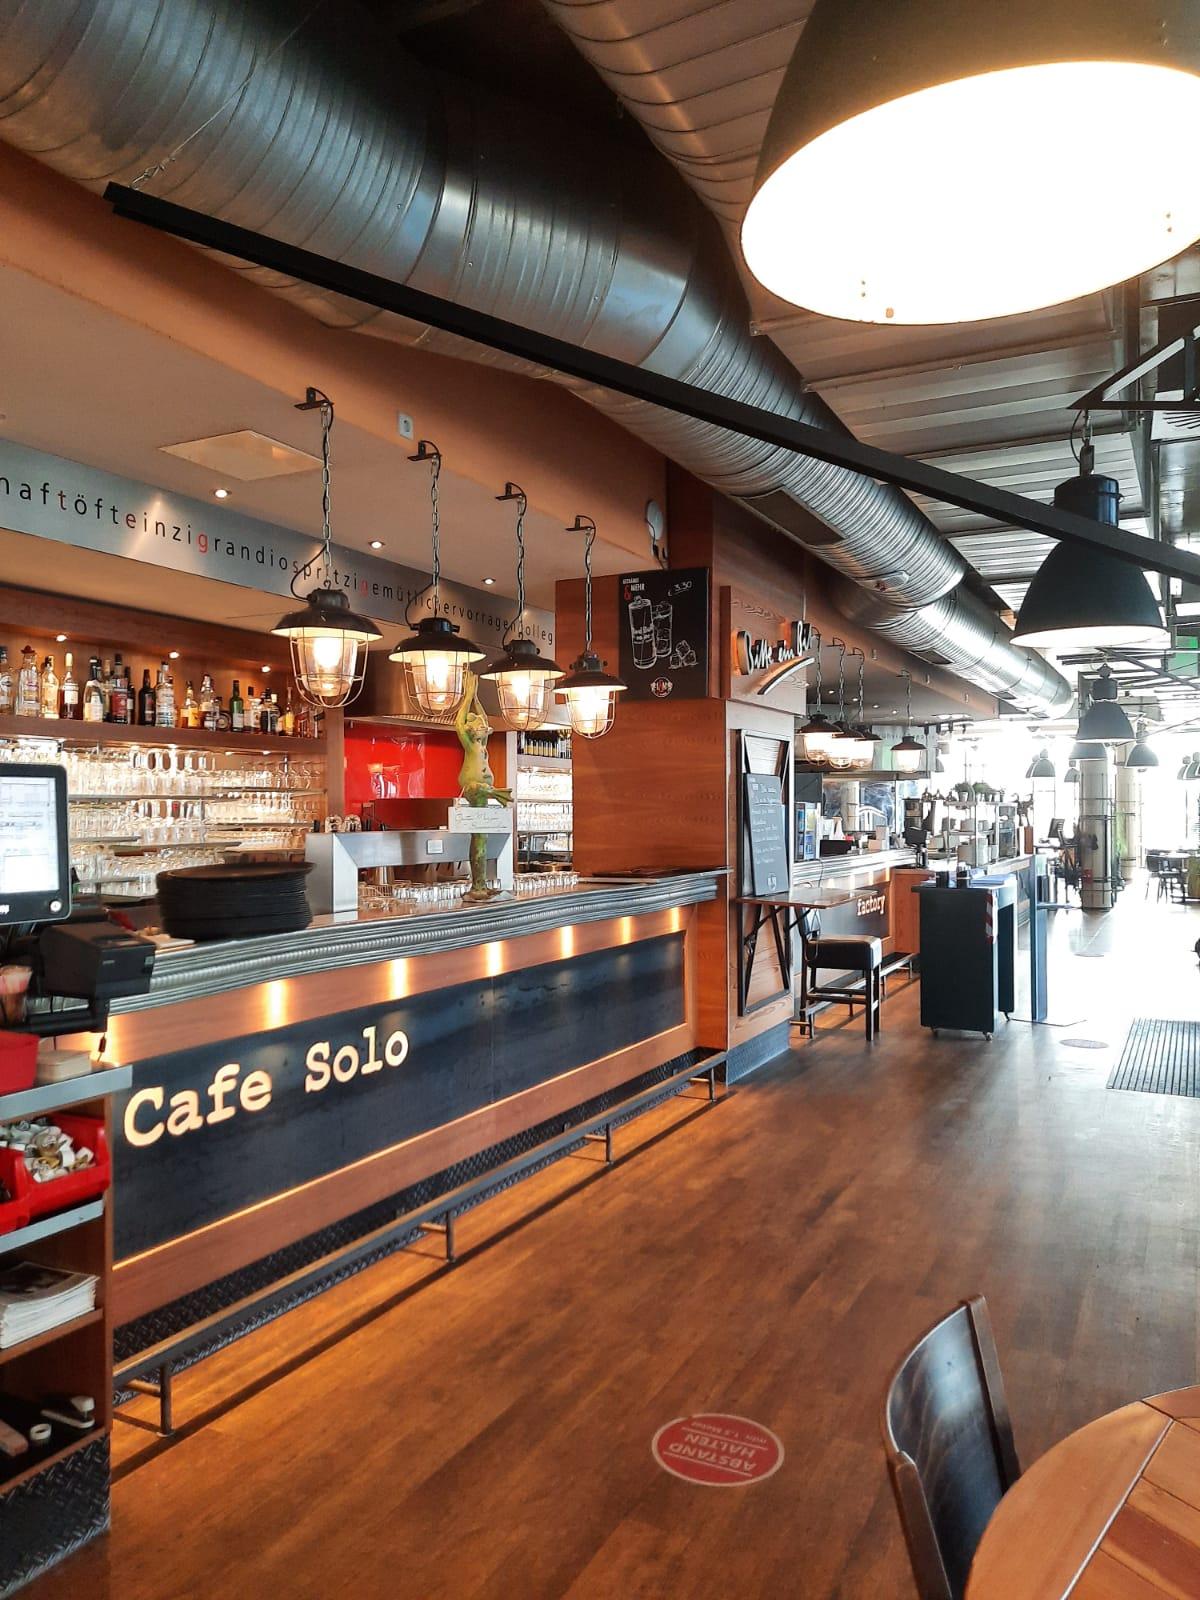 Cafe Solo Dortmund Bar